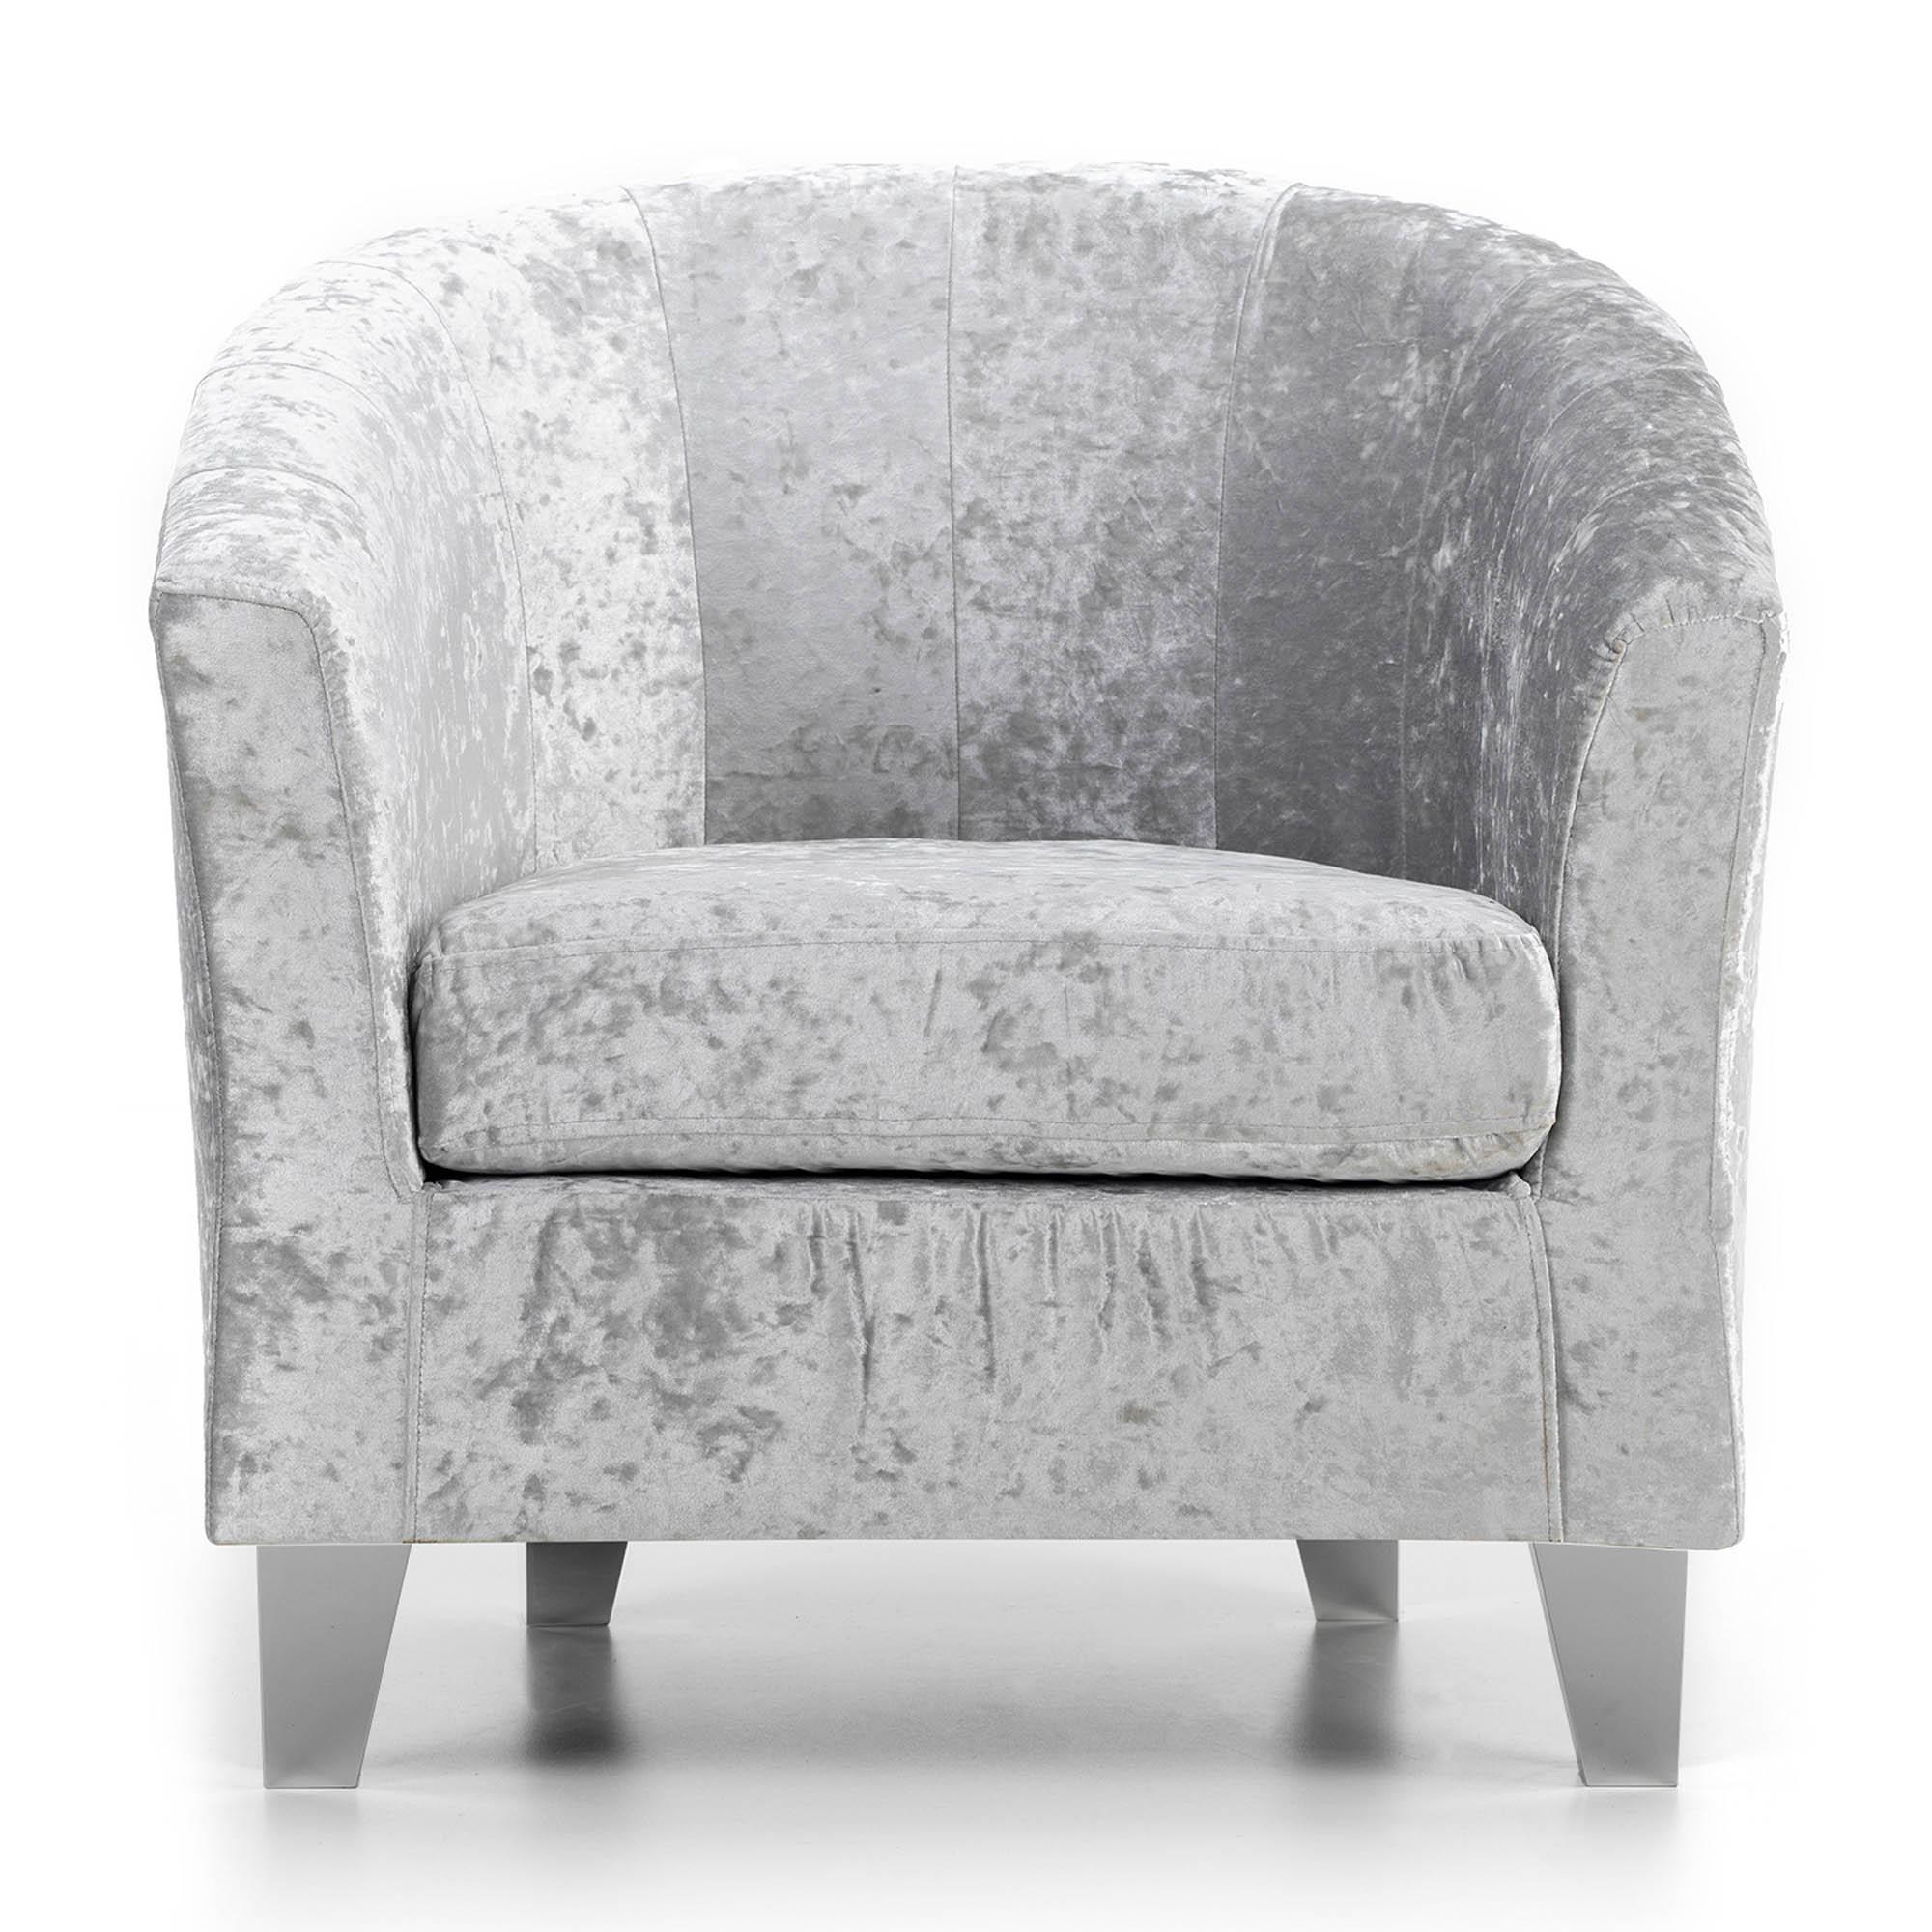 Starlet Tub Chair - Silver | Dunelm